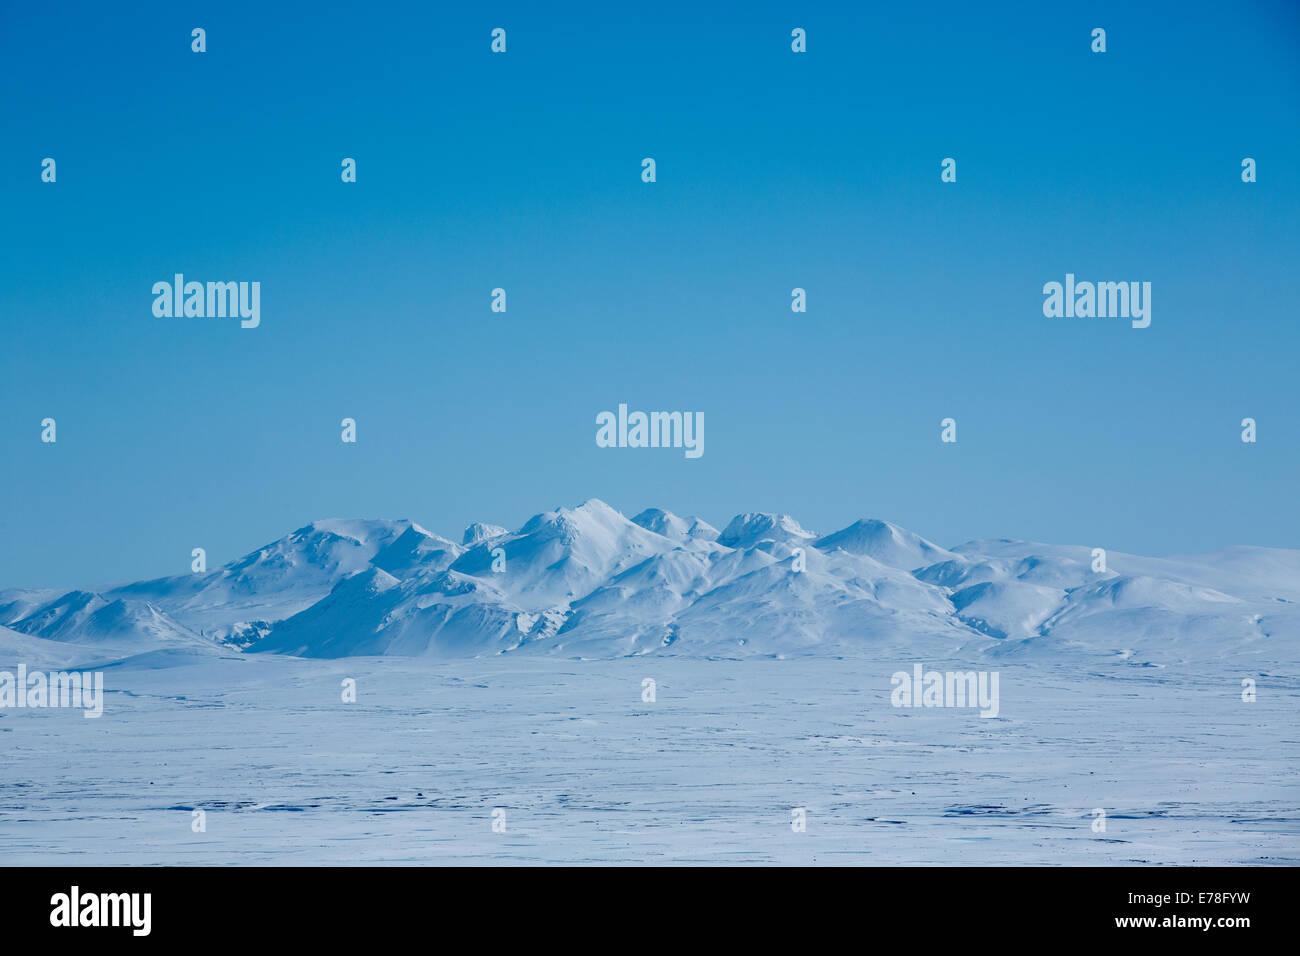 on the Langjökull glacier, Iceland Stock Photo